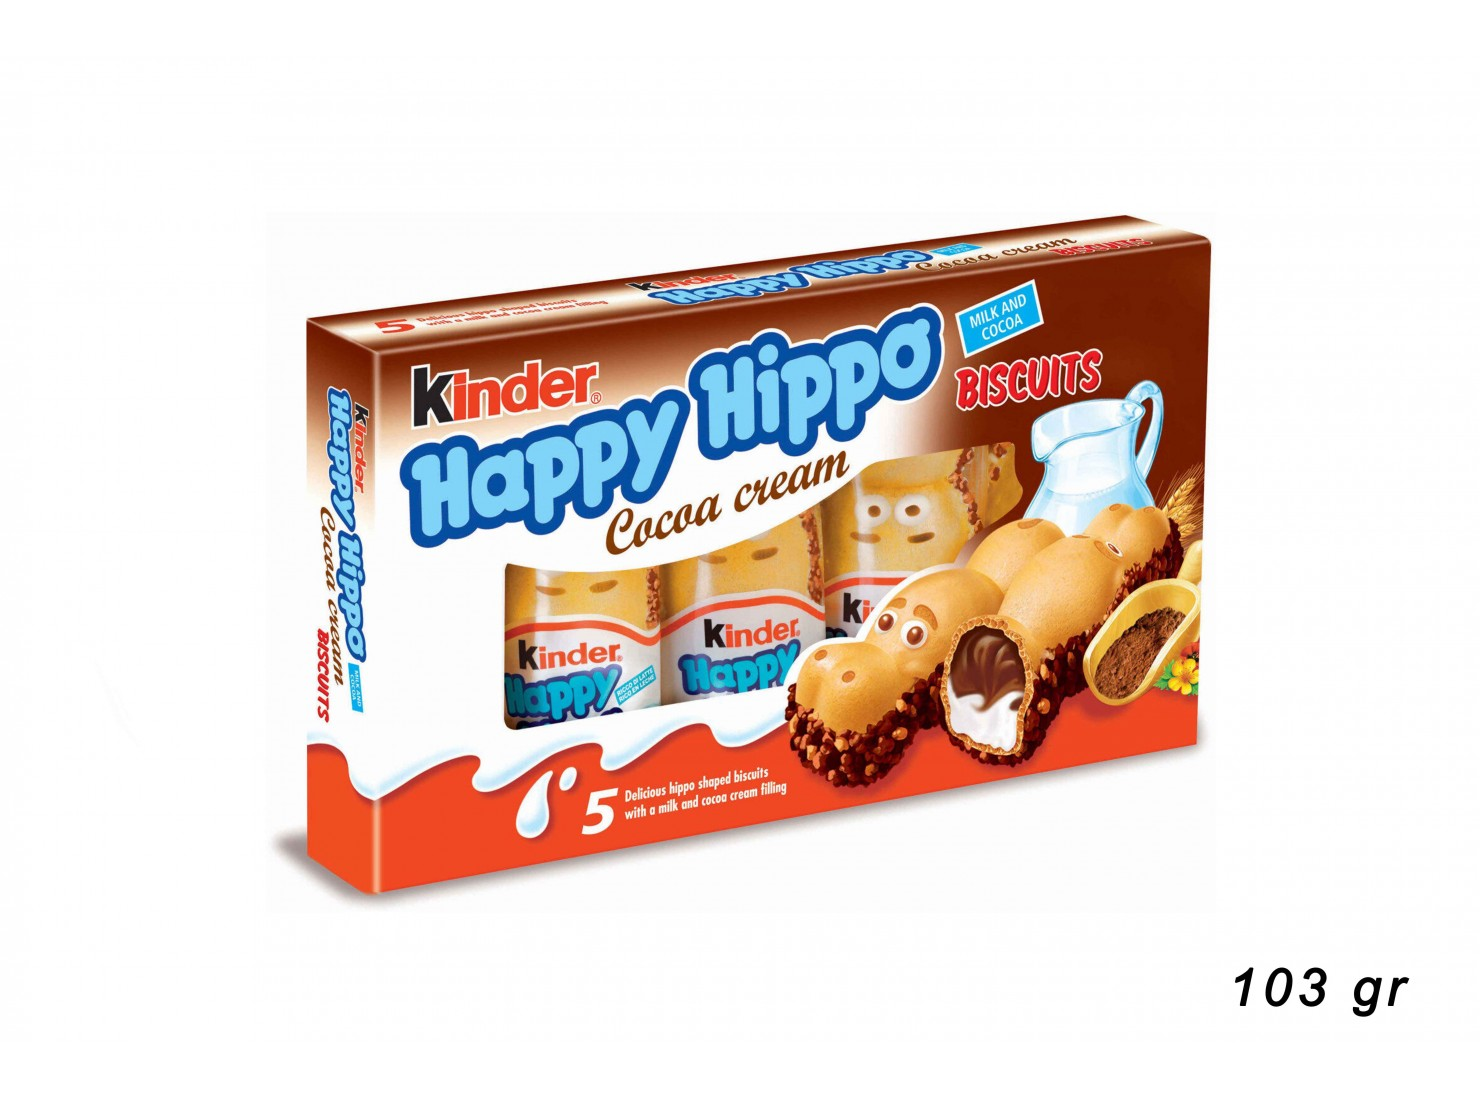 HAPPY HIPPO CACAO 5 PZ KINDER